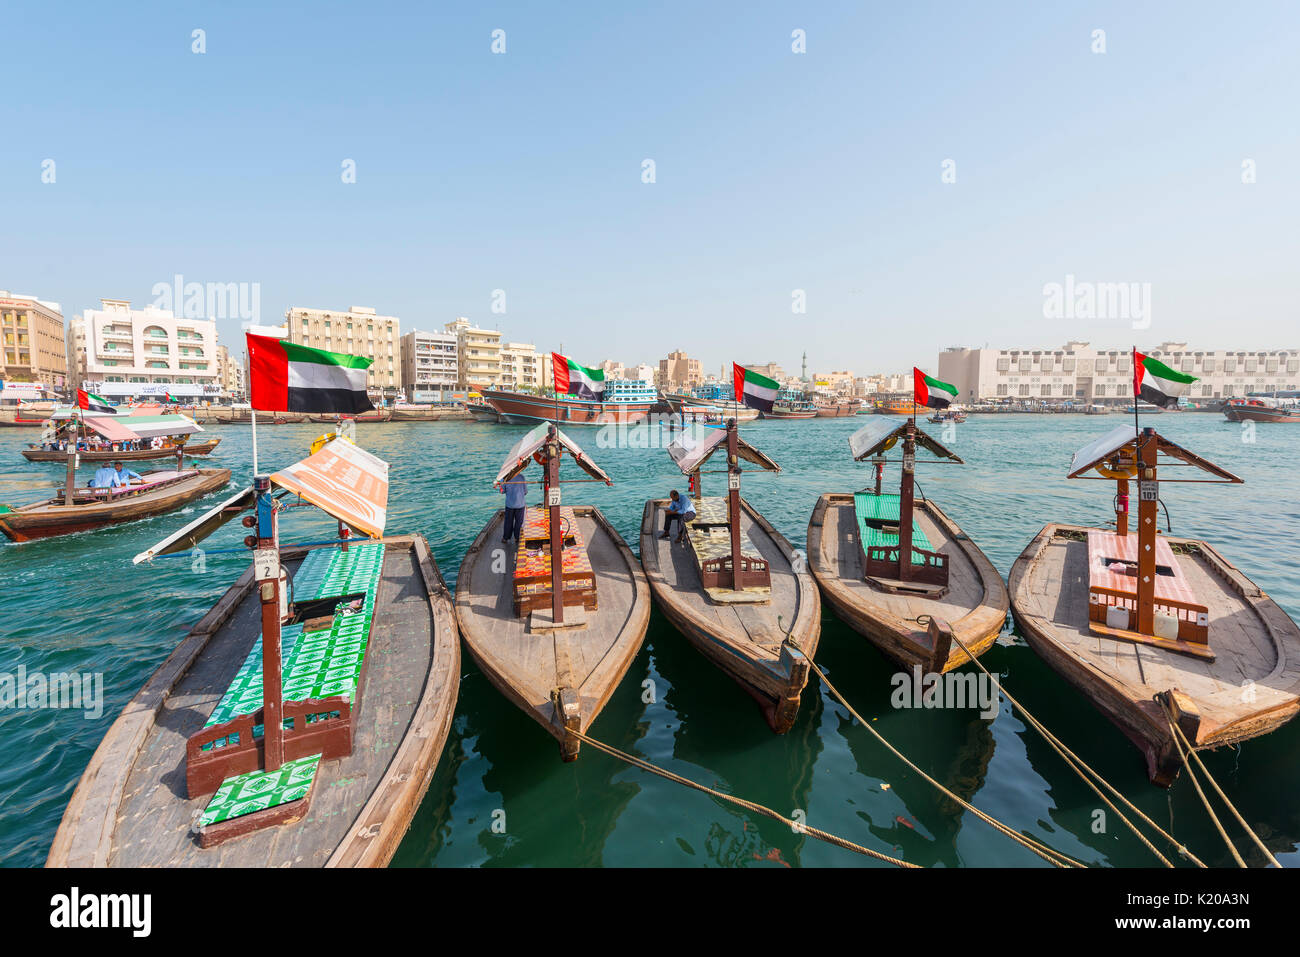 Small traditional ships on the Creek, Old Dubai, United Arab Emirates - Stock Image